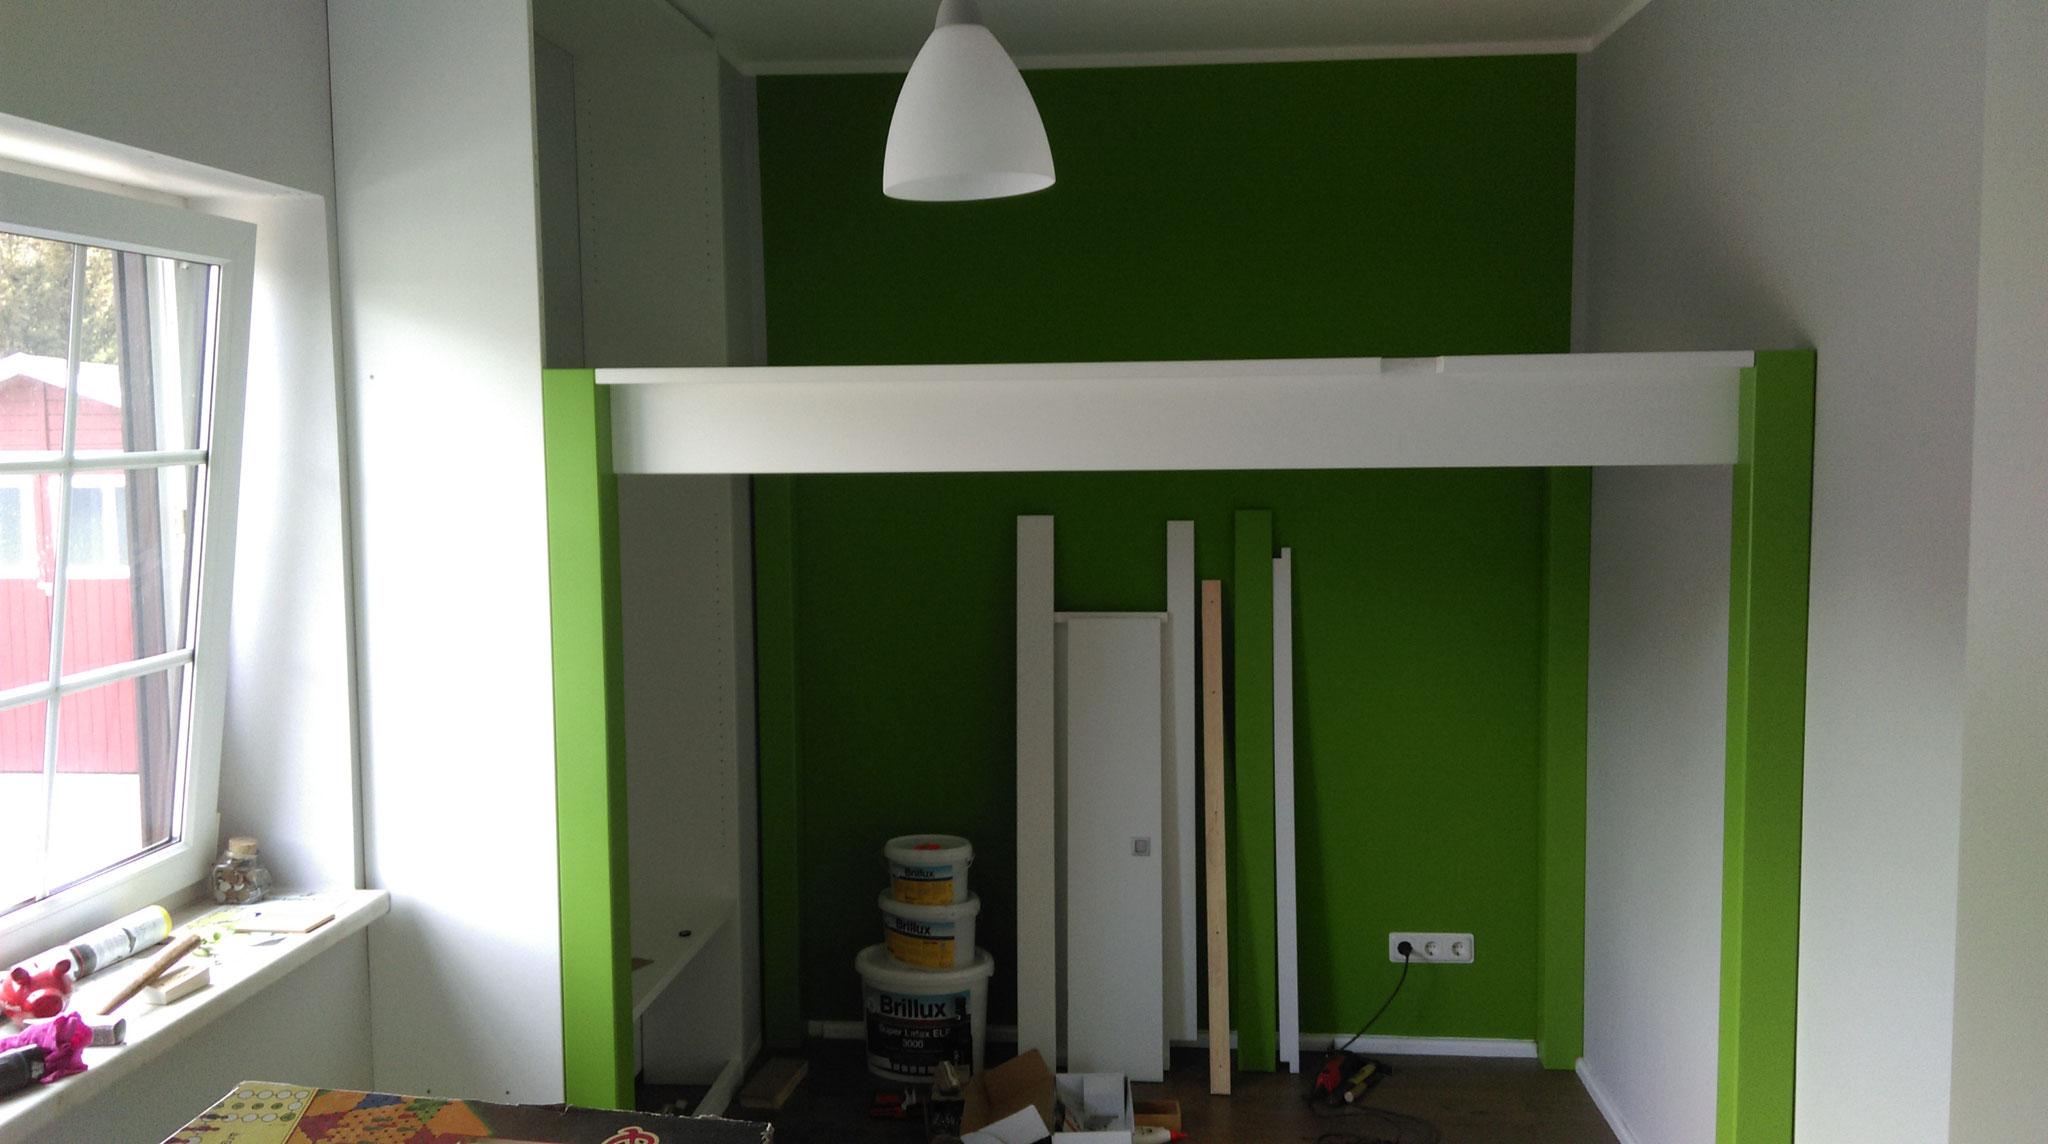 hochbett mit integriertem regal manufakturhartmanns webseite. Black Bedroom Furniture Sets. Home Design Ideas